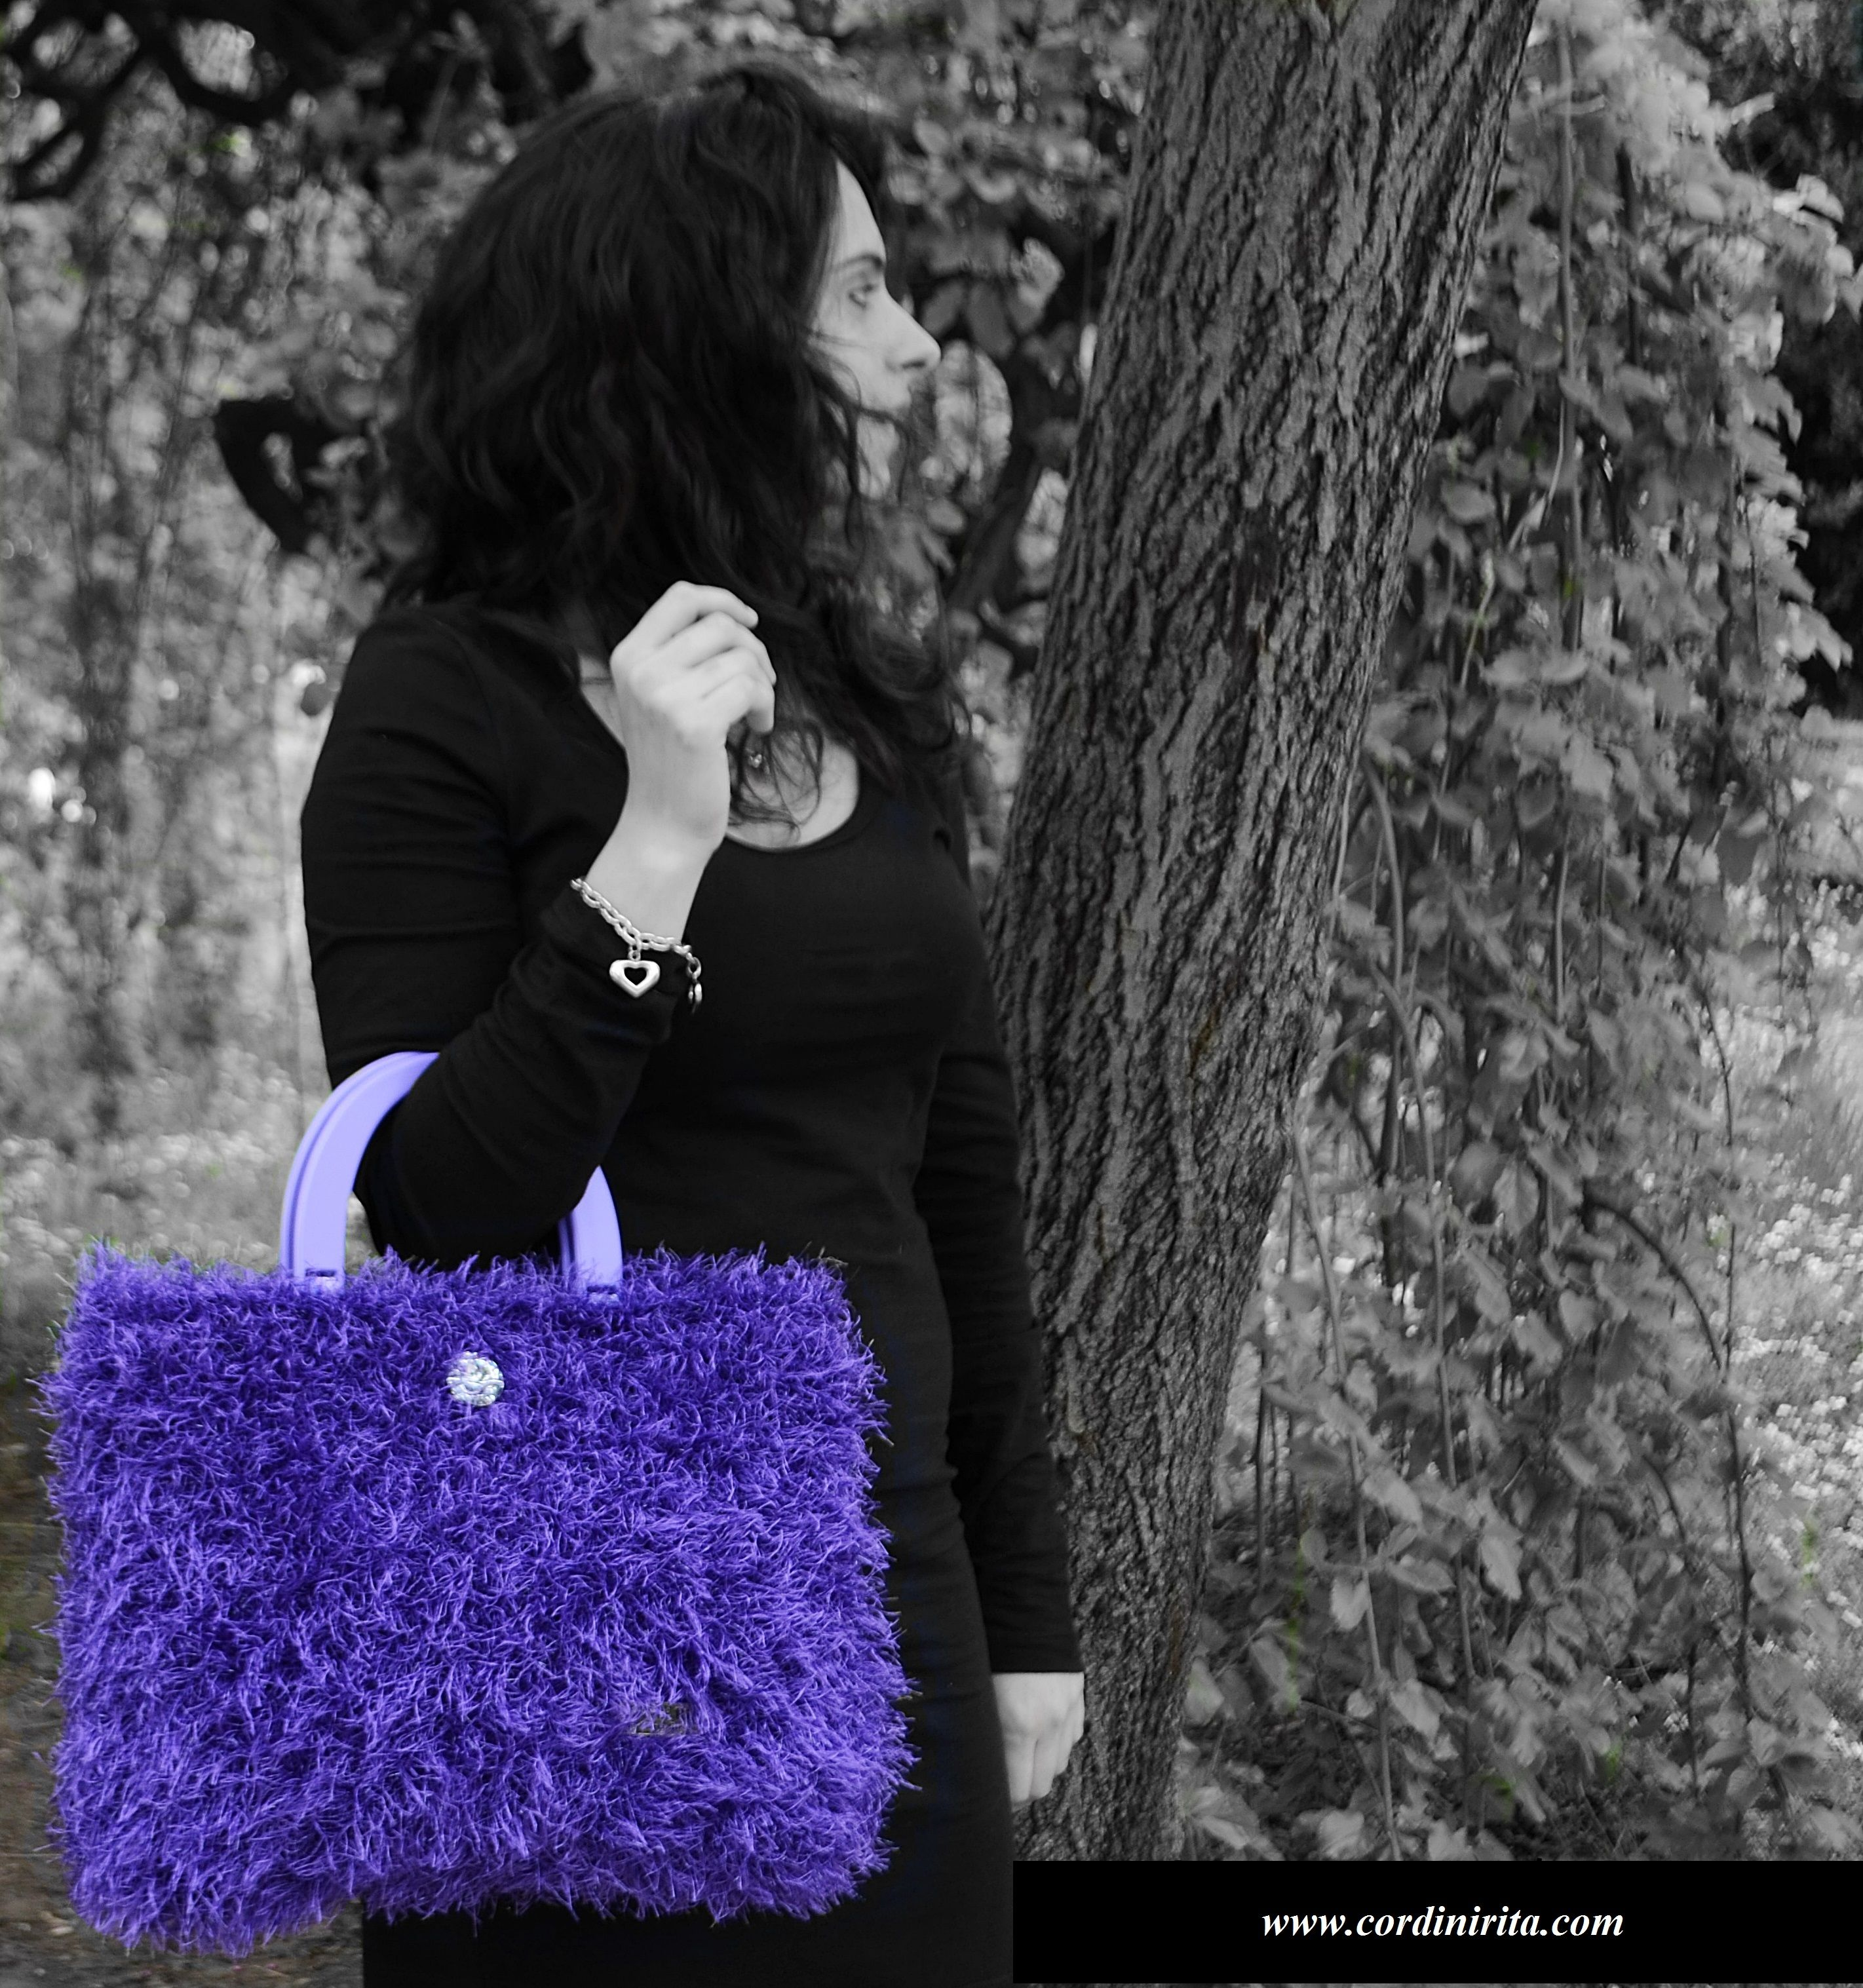 Hollywood Handbag - Italian Excellence and creativity - Handmade in Italy  www.cordinirita.com